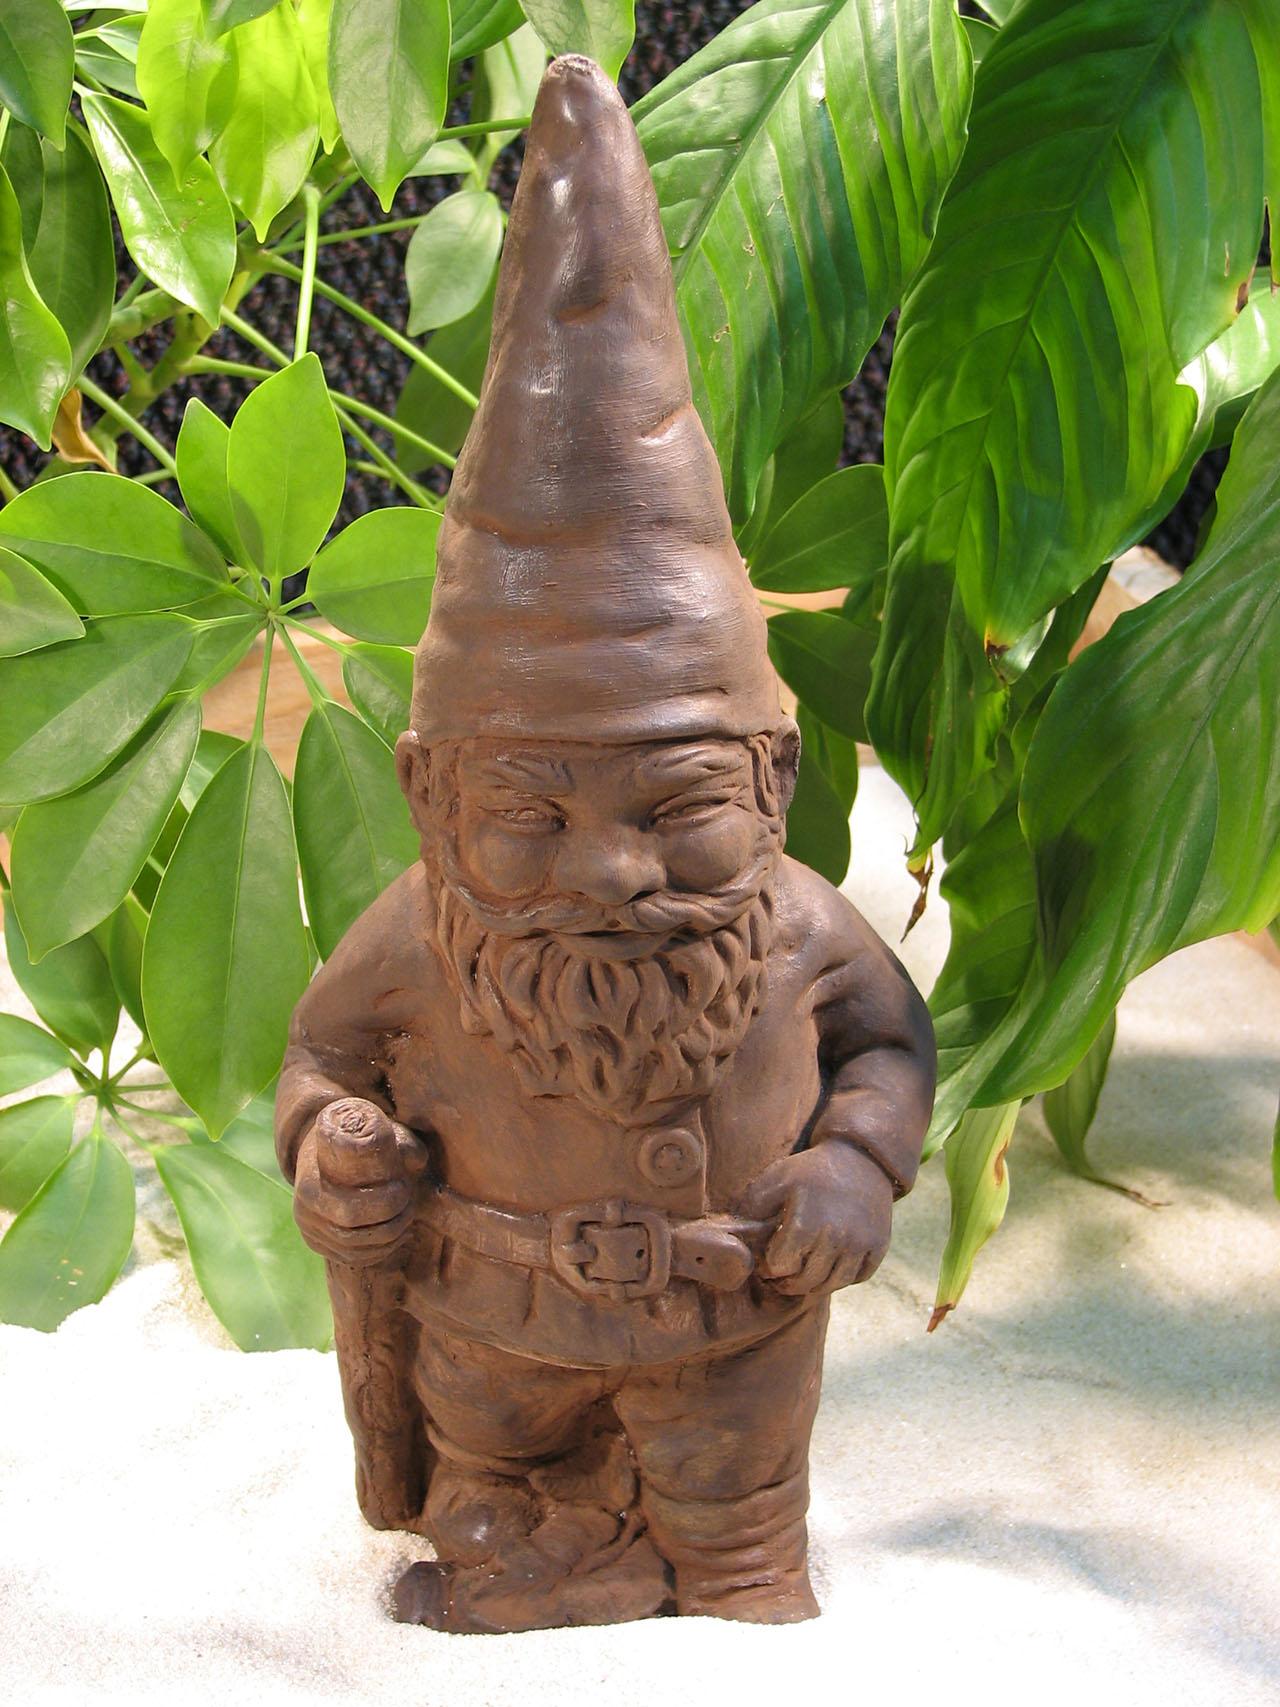 Gnome Garden: Hiking Gnome